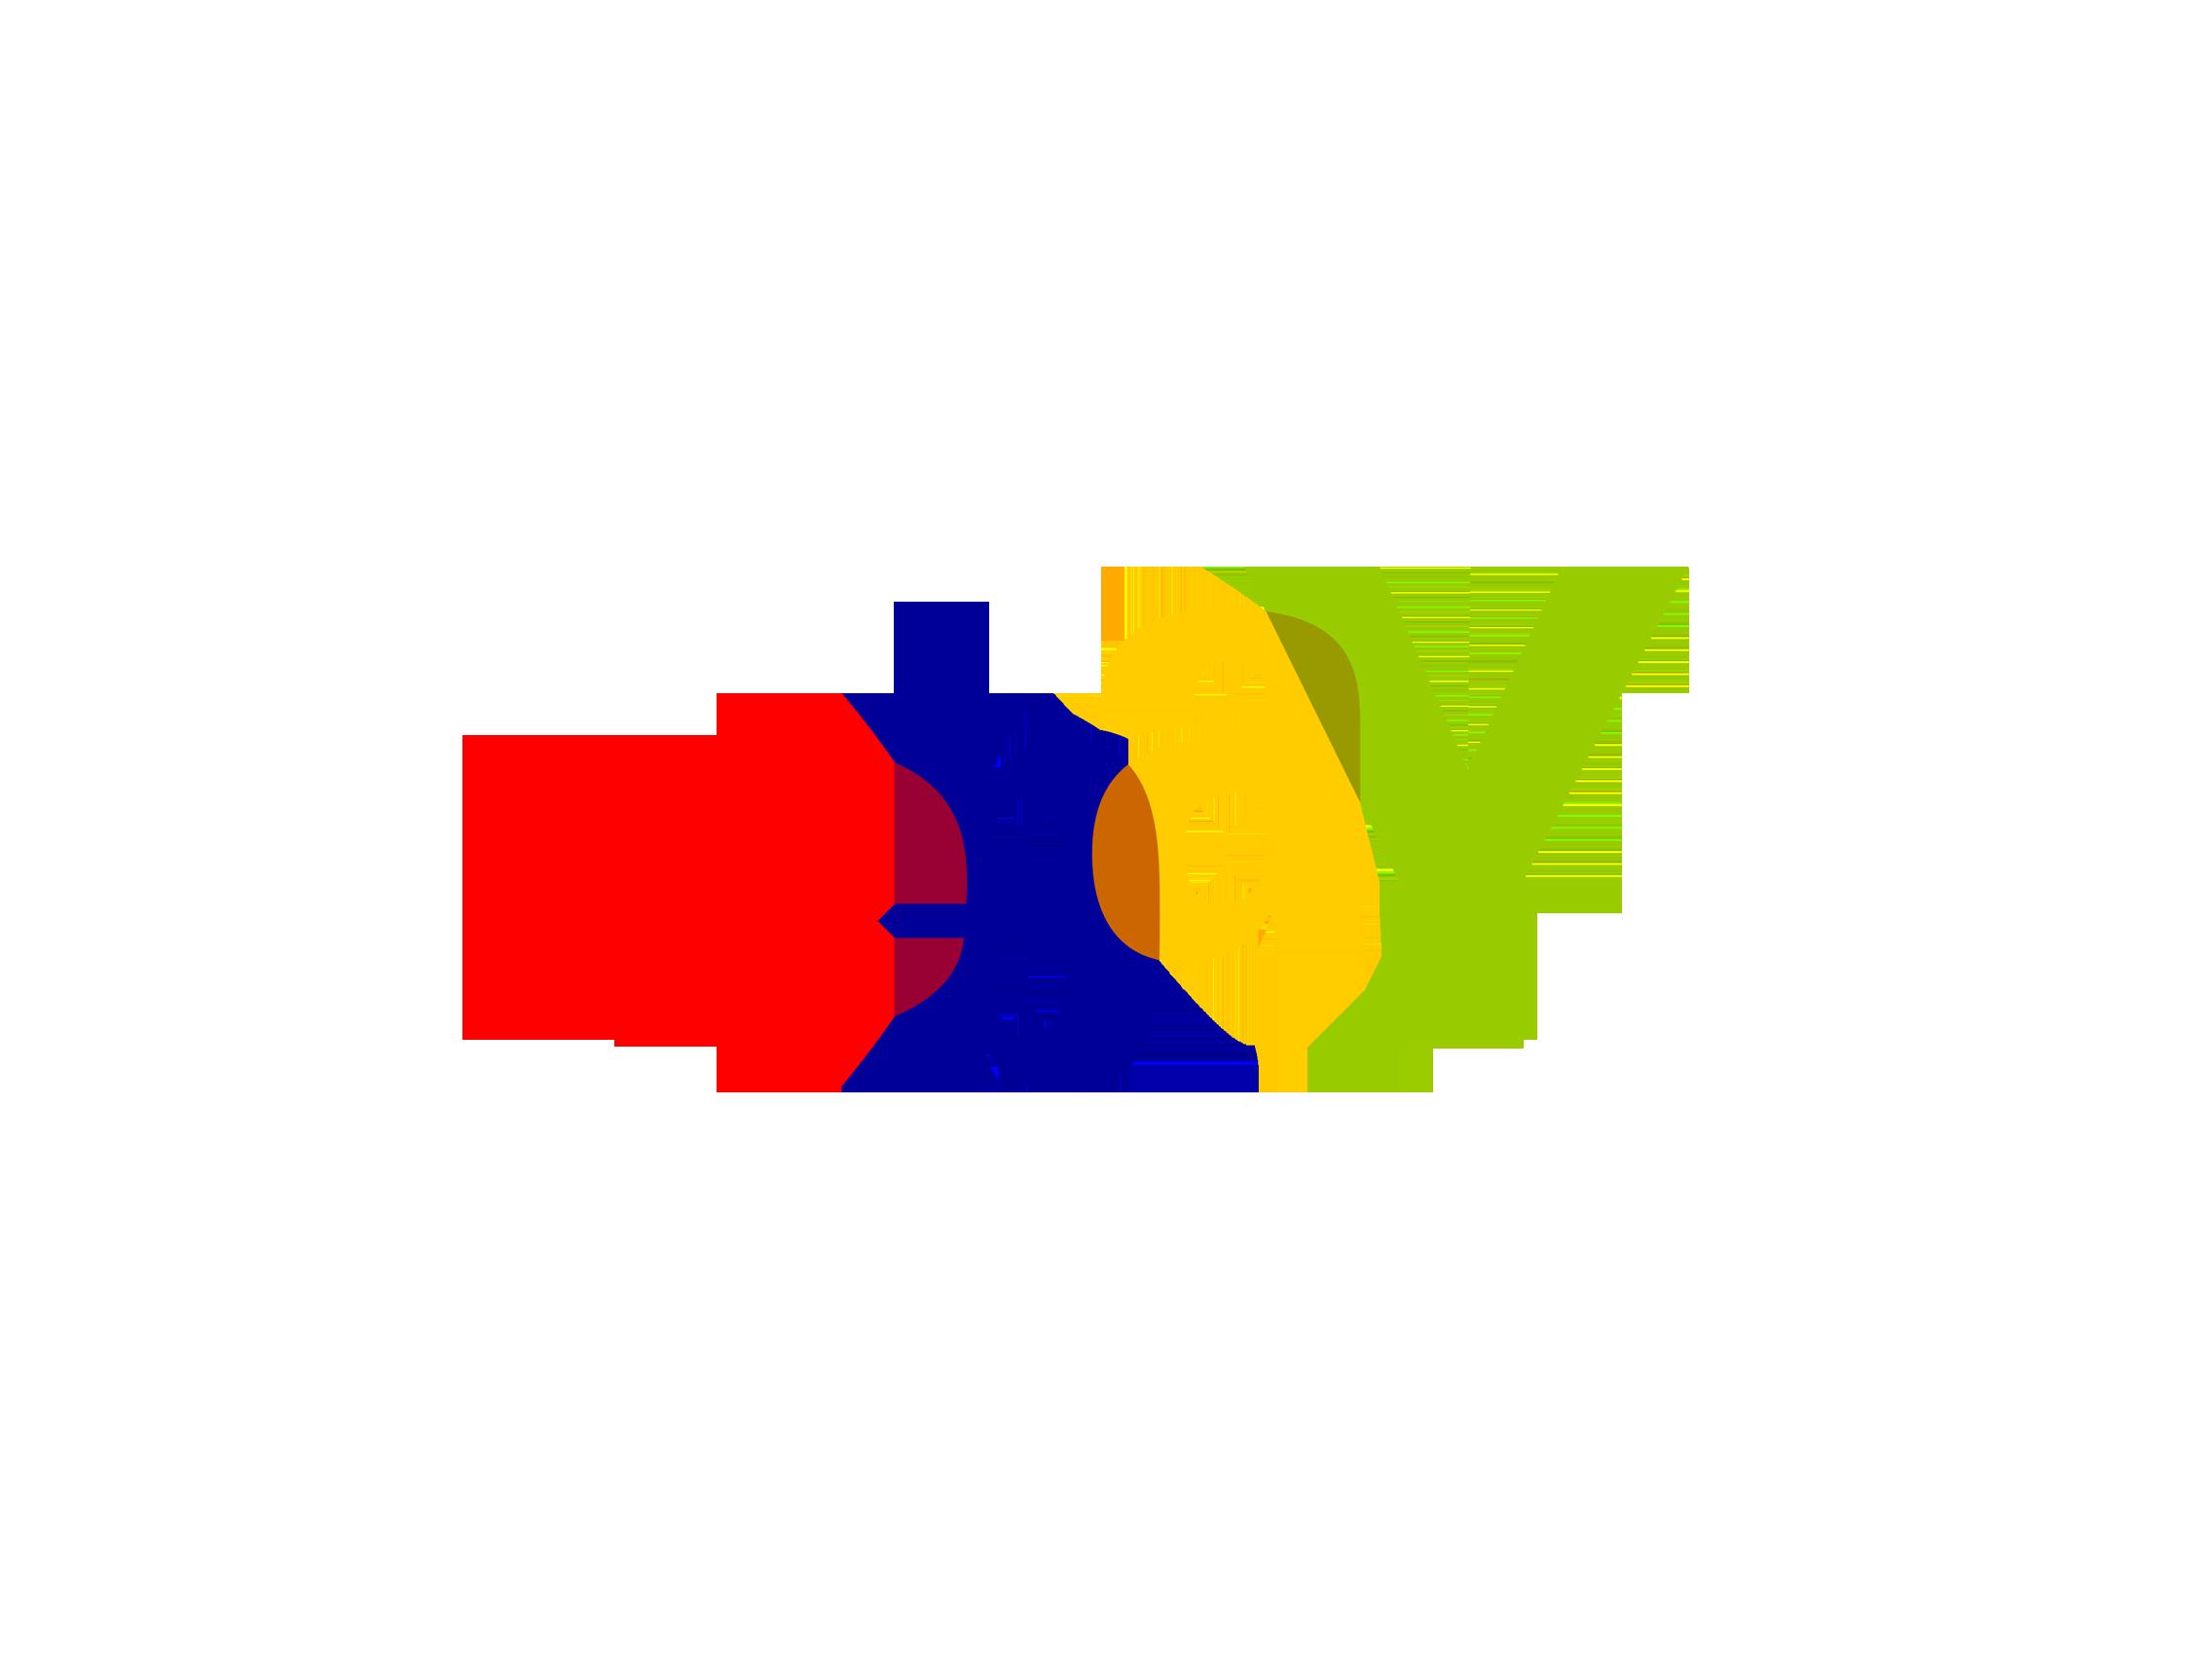 Logo Ebay Png Hdpng.com 2272 - Ebay, Transparent background PNG HD thumbnail